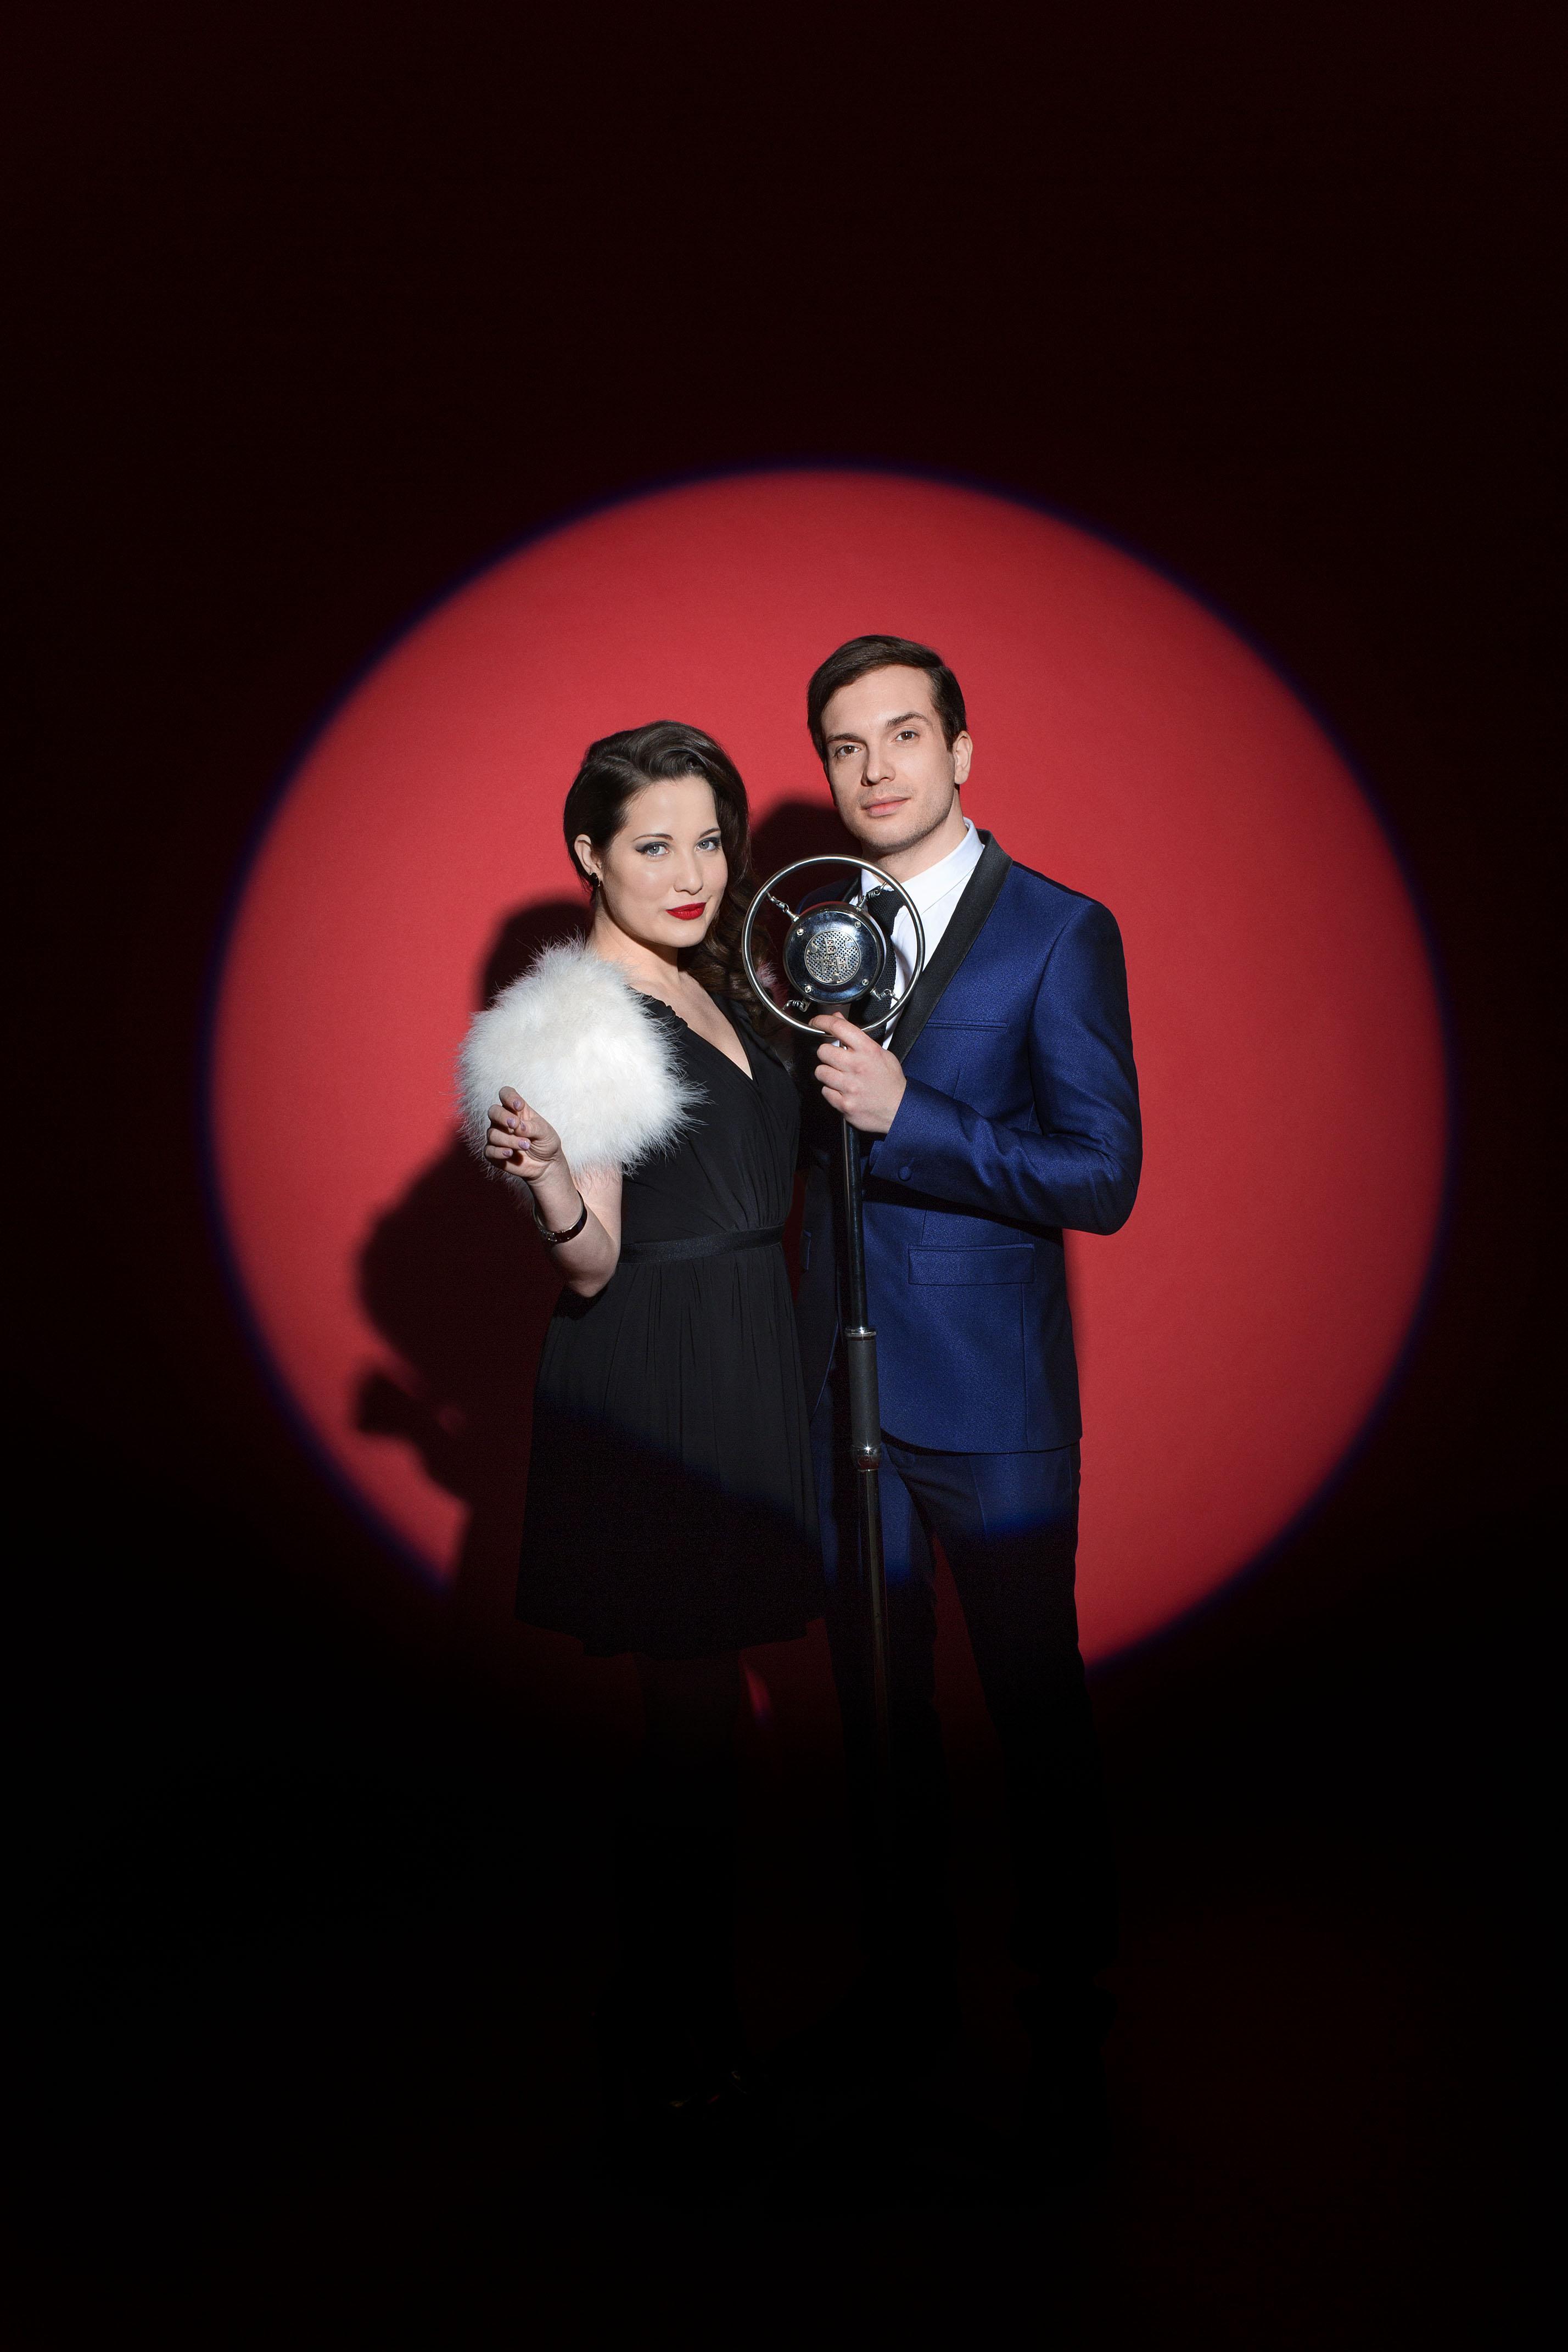 Programme Name: Eurovision 2015 (C) BBC - Photographer: Sarah Dunn